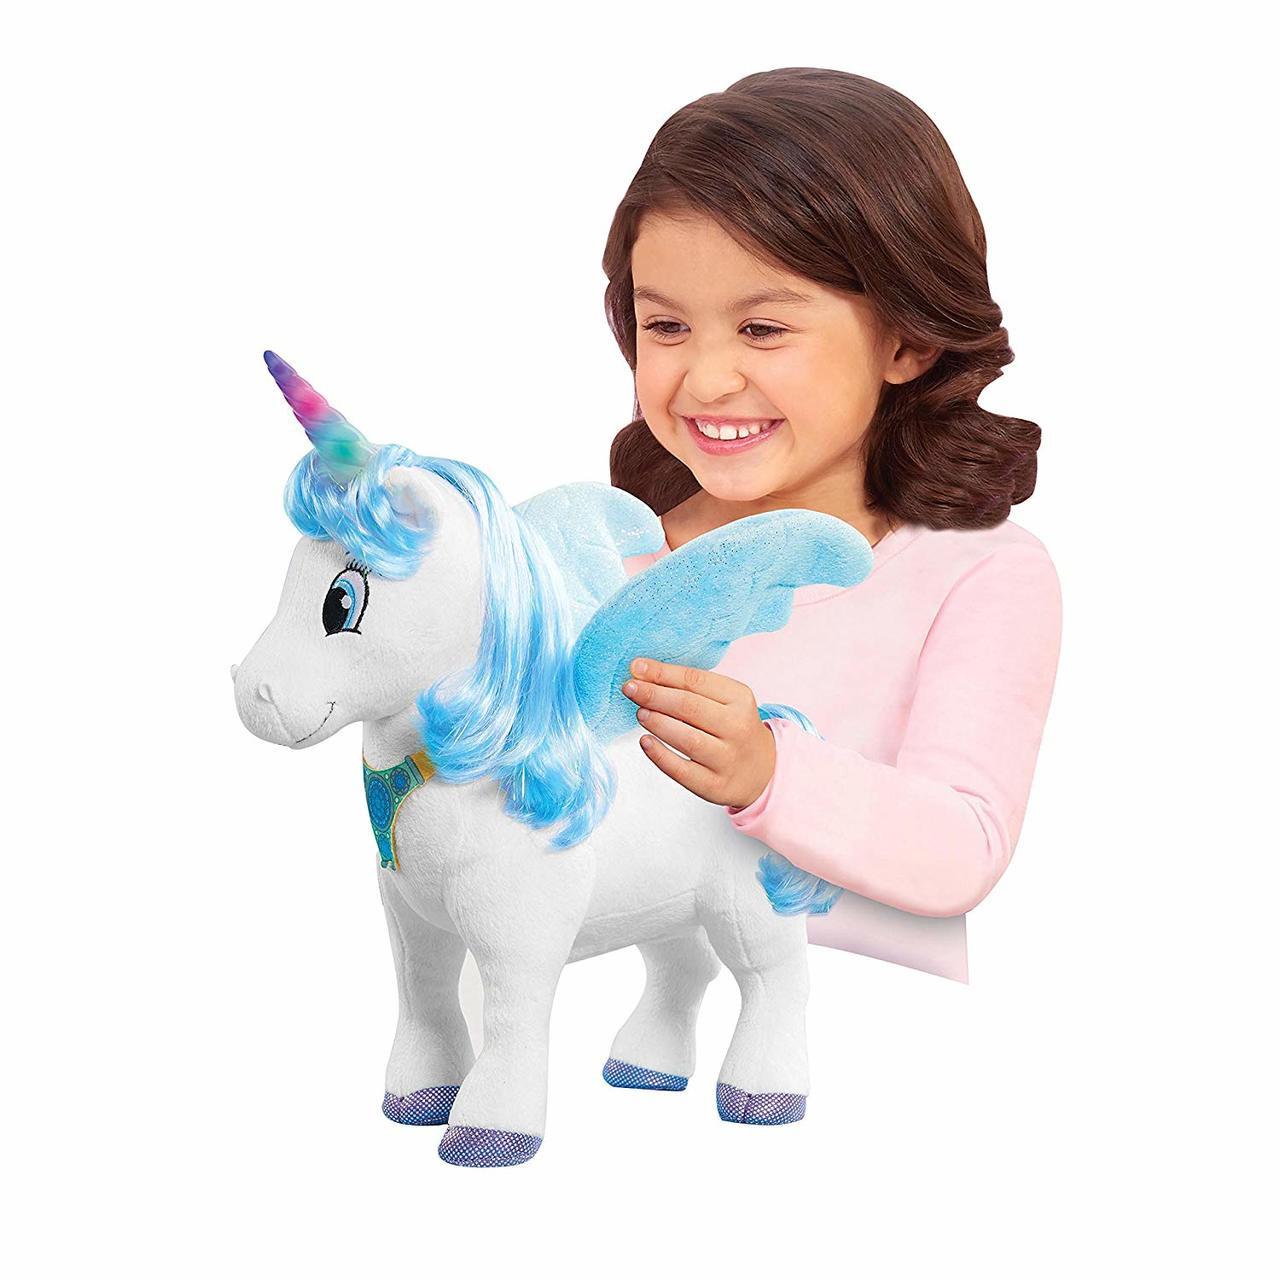 Sofia The First Skye The Unicorn Feature Plush